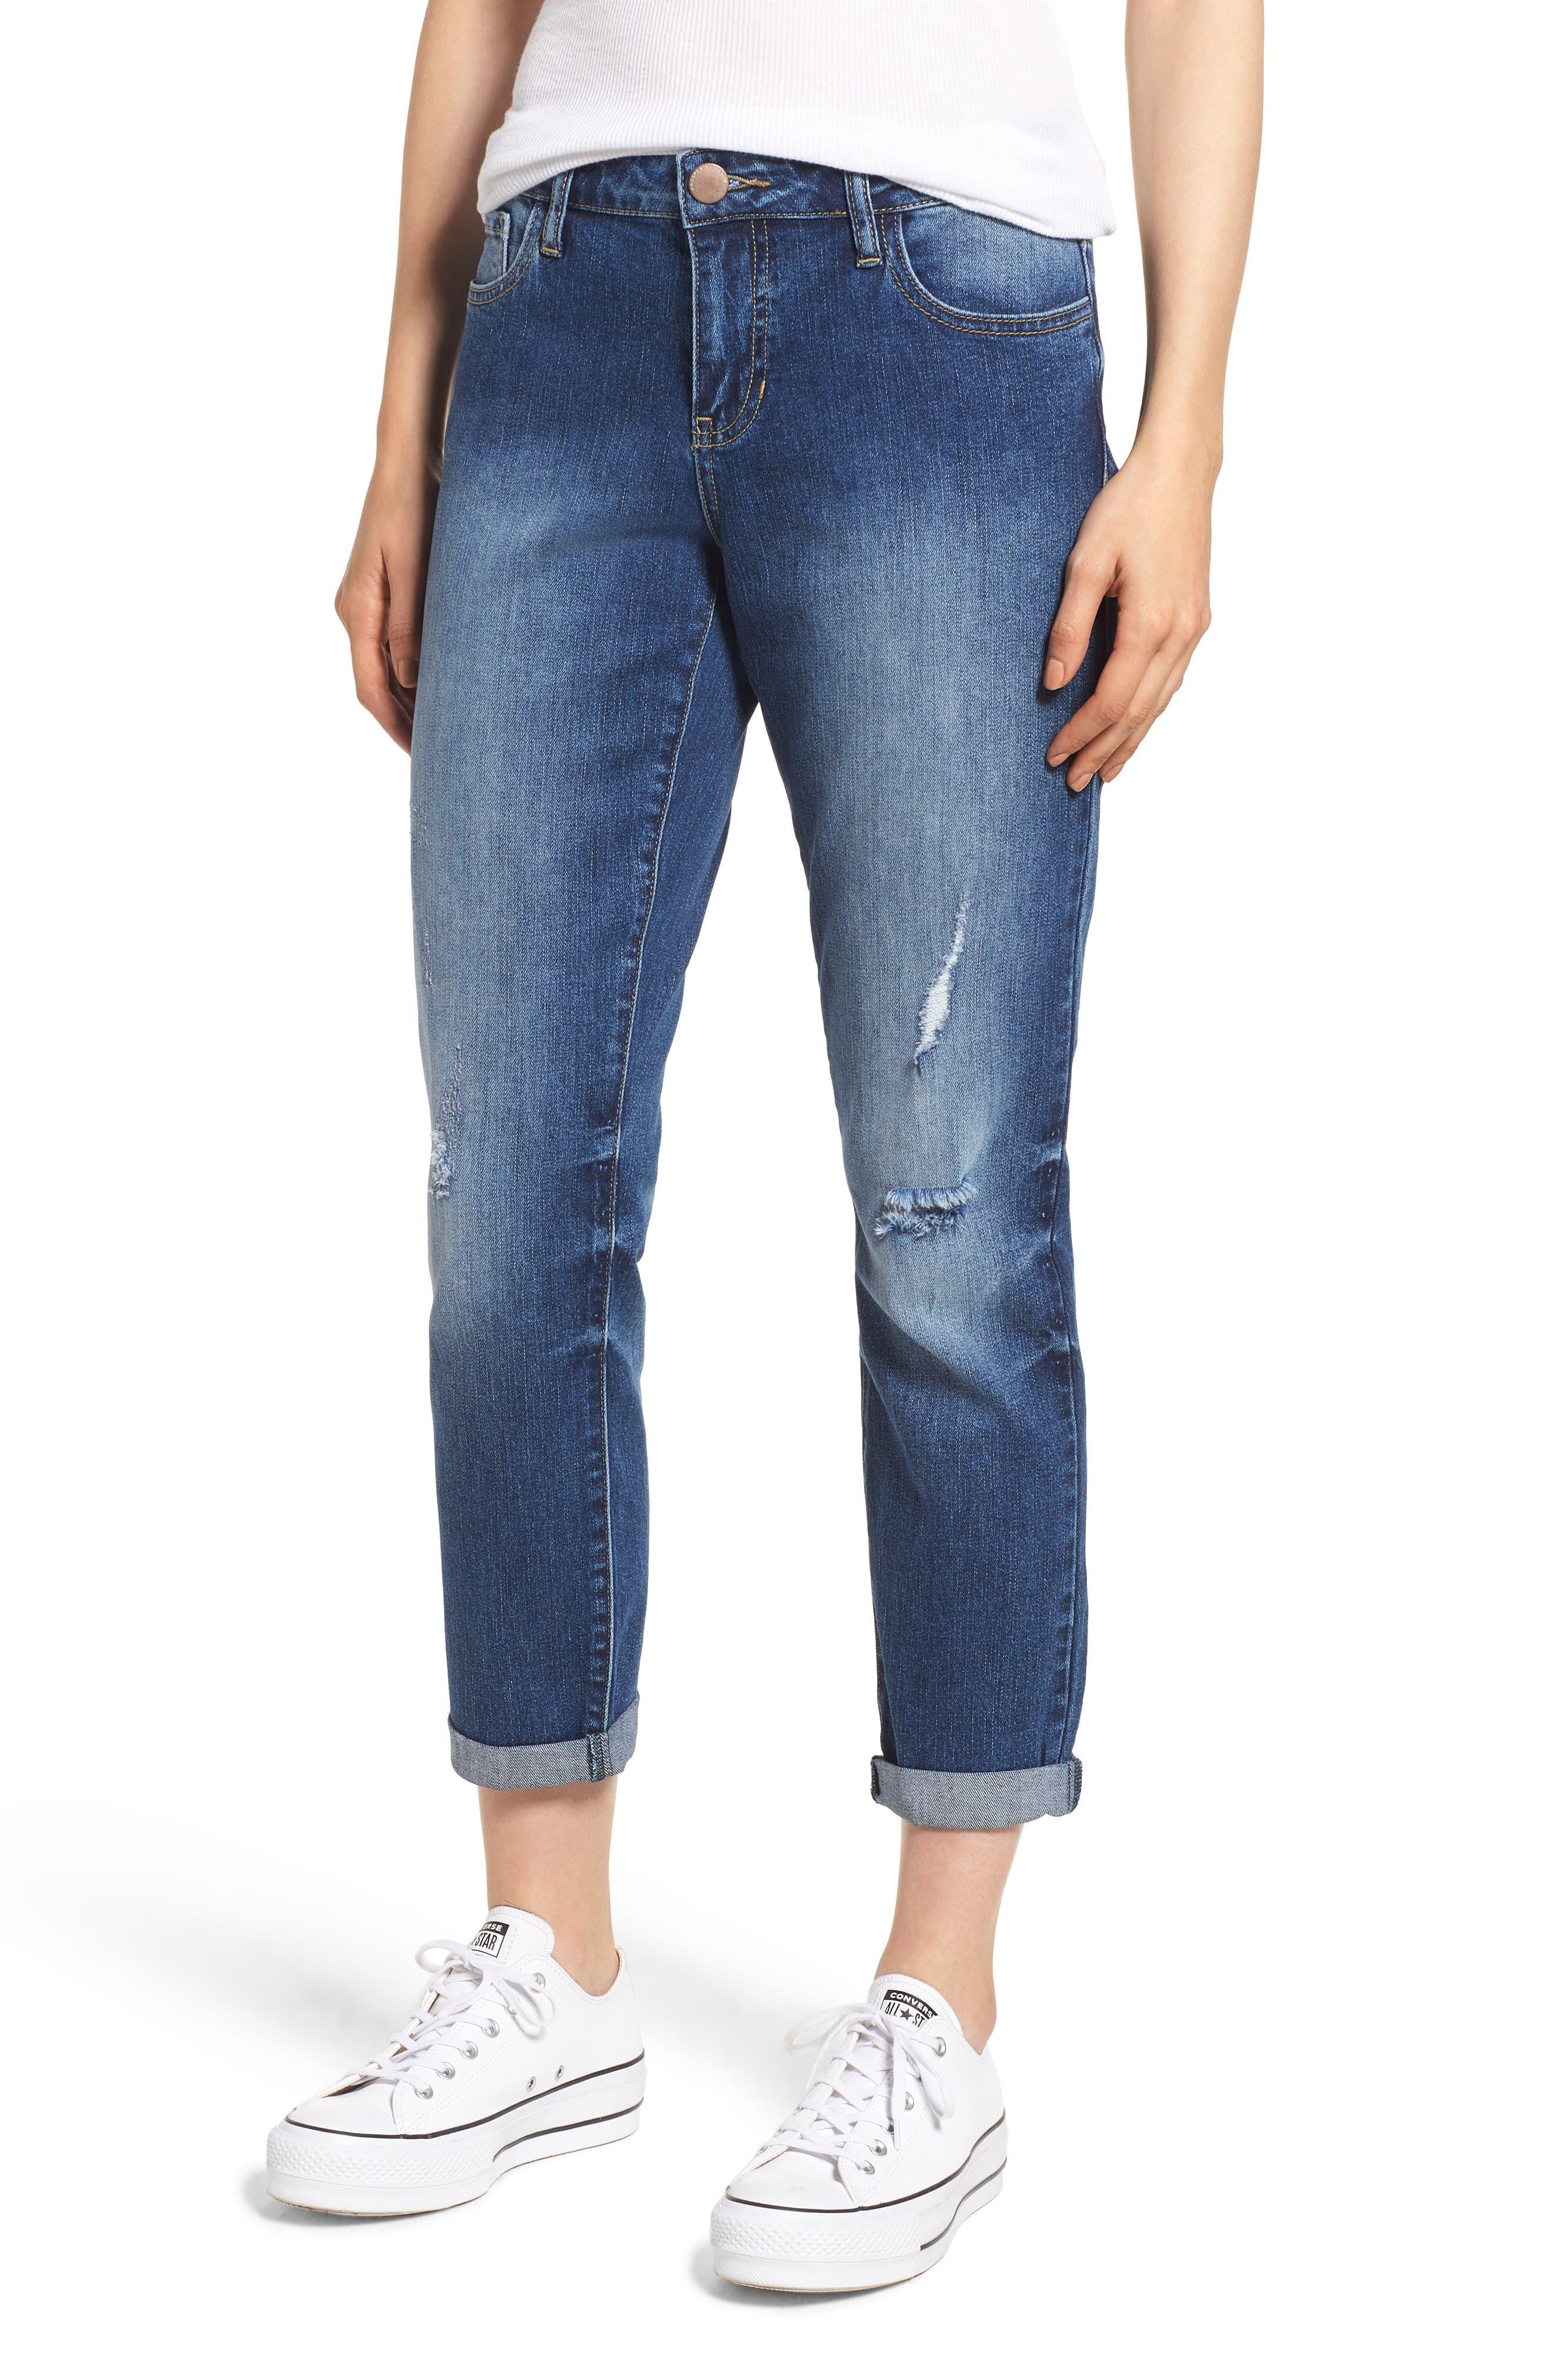 PROSPERITY DENIM, Ripped Girlfriend Jeans, Main thumbnail 1, color, BLUE